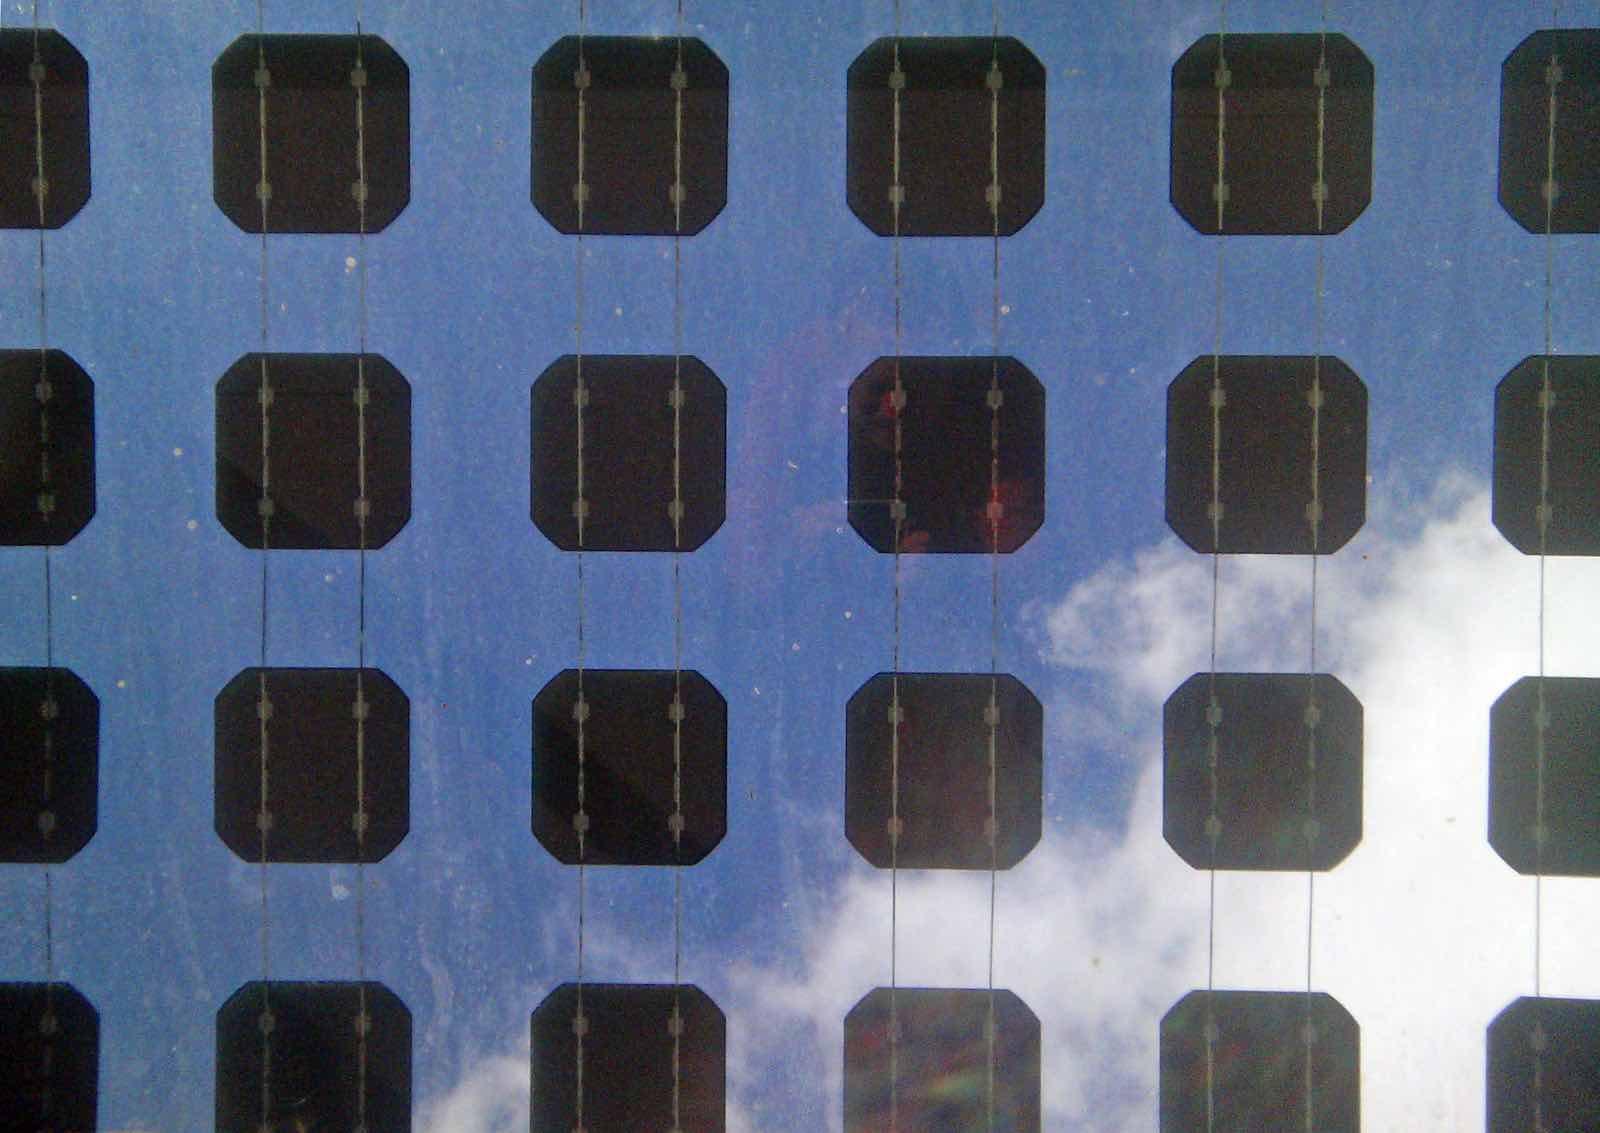 Solar panels (Photo: Rae Allen/Flickr)